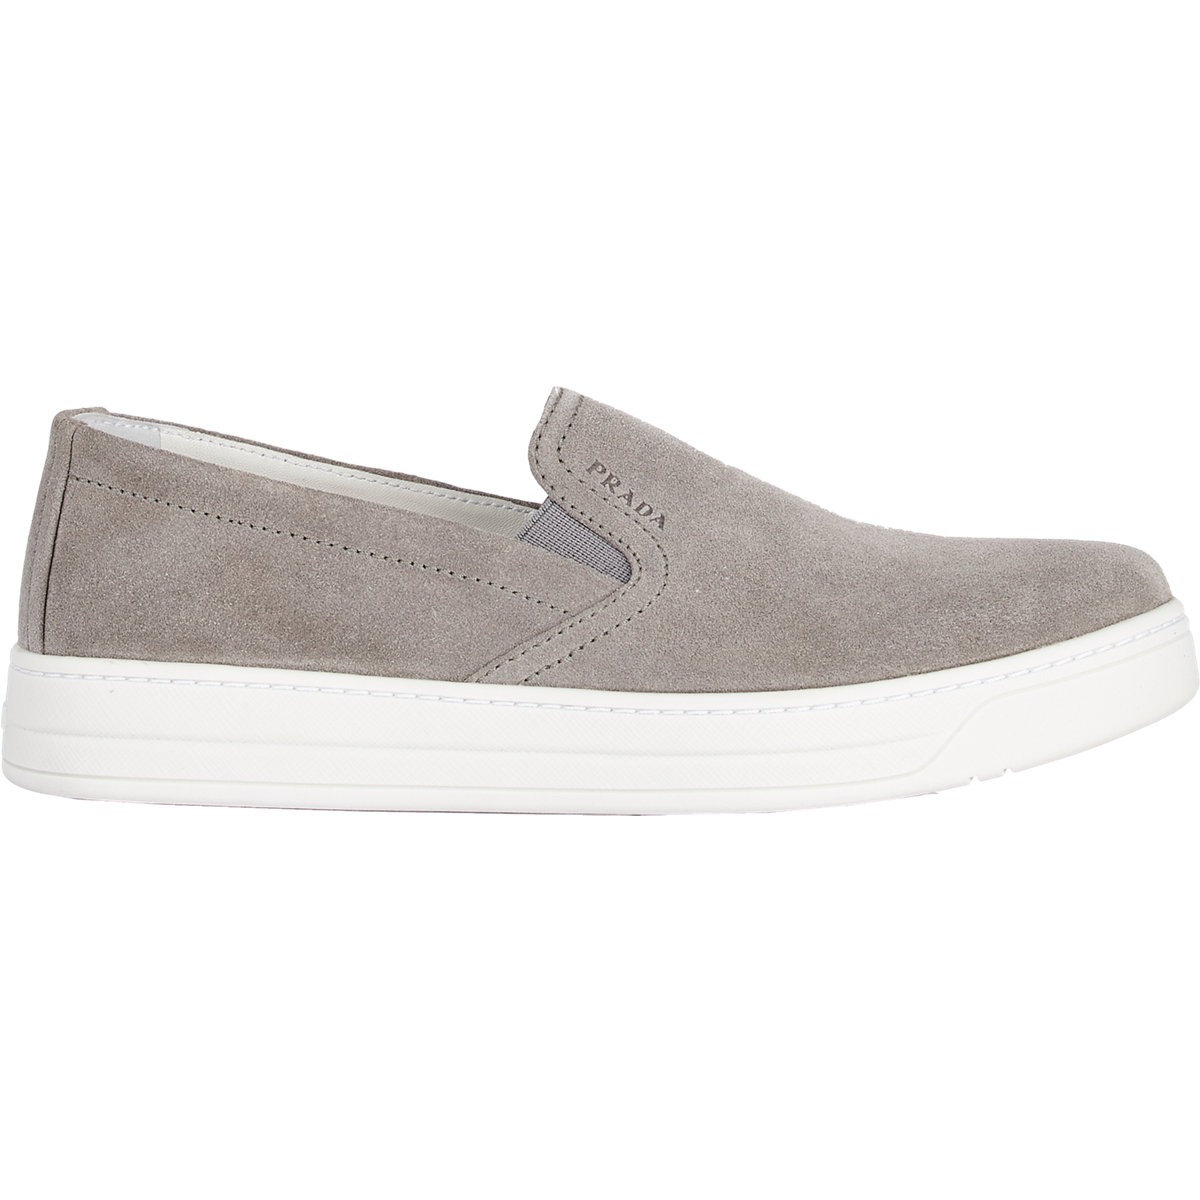 Slip Lyst Sneakers Gray Prada On In Suede 354RLAqj